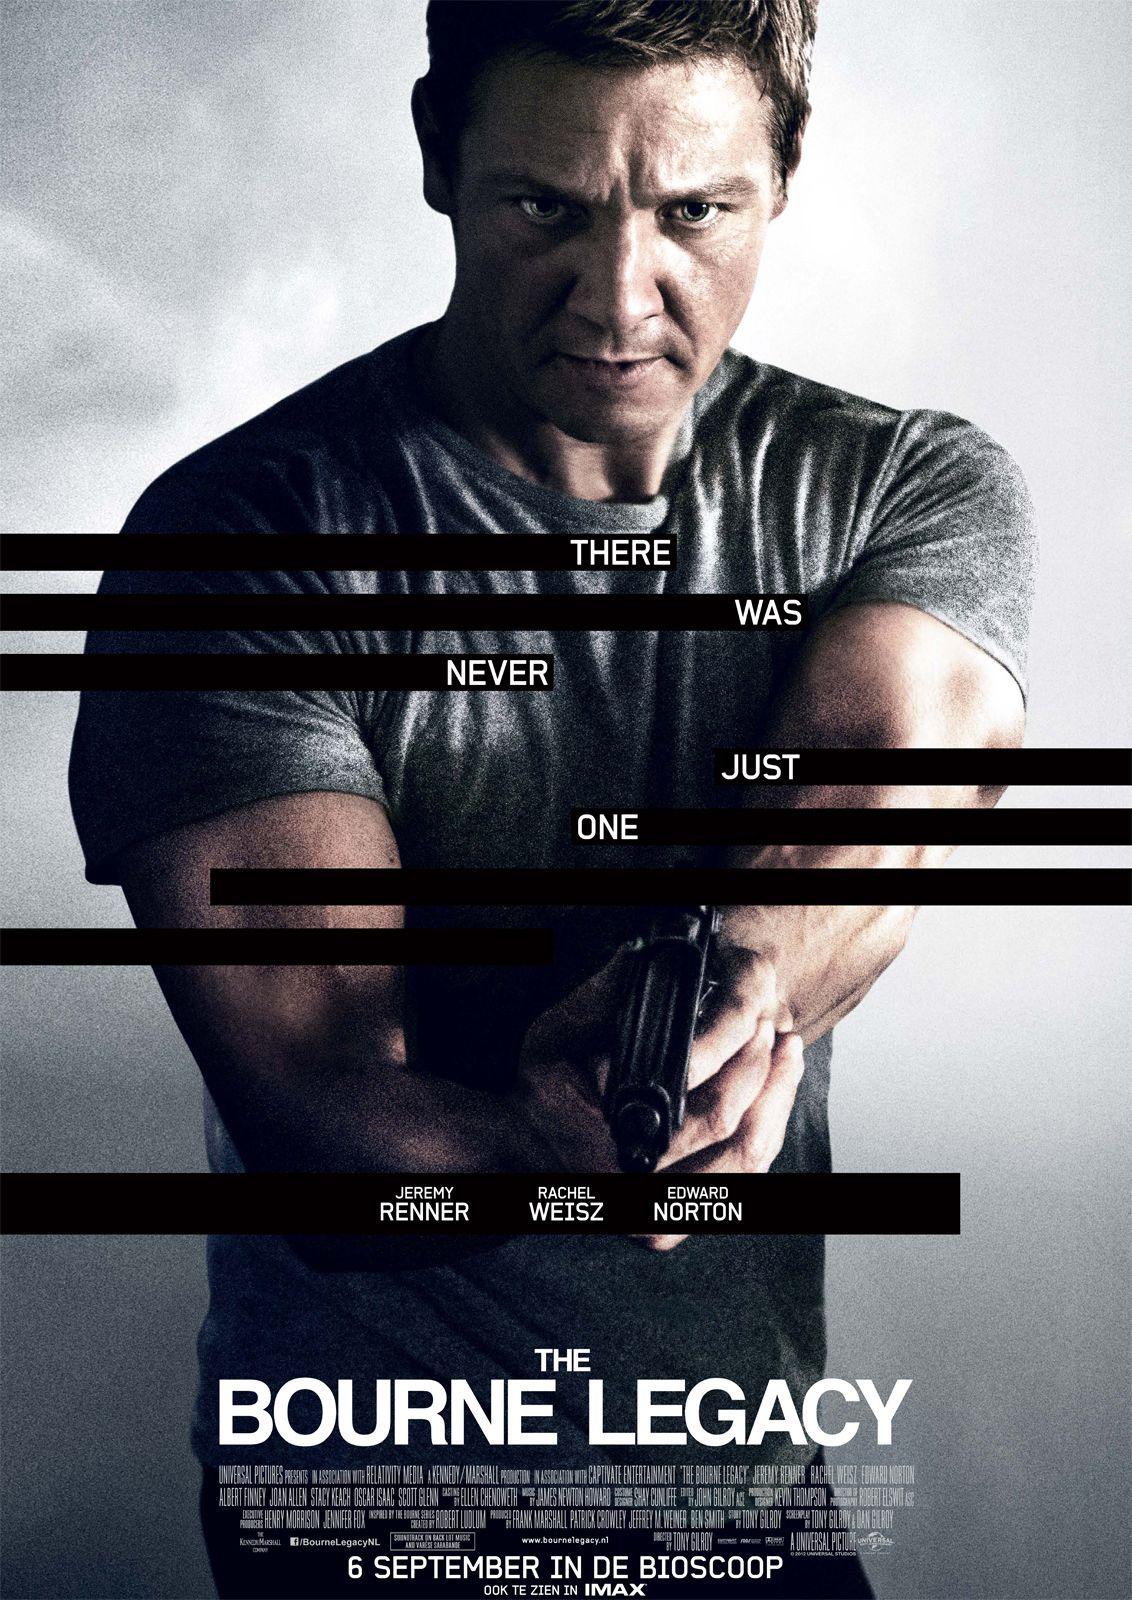 The Bourne Legacy 2012 Jeremy Renner Bioscoop Film